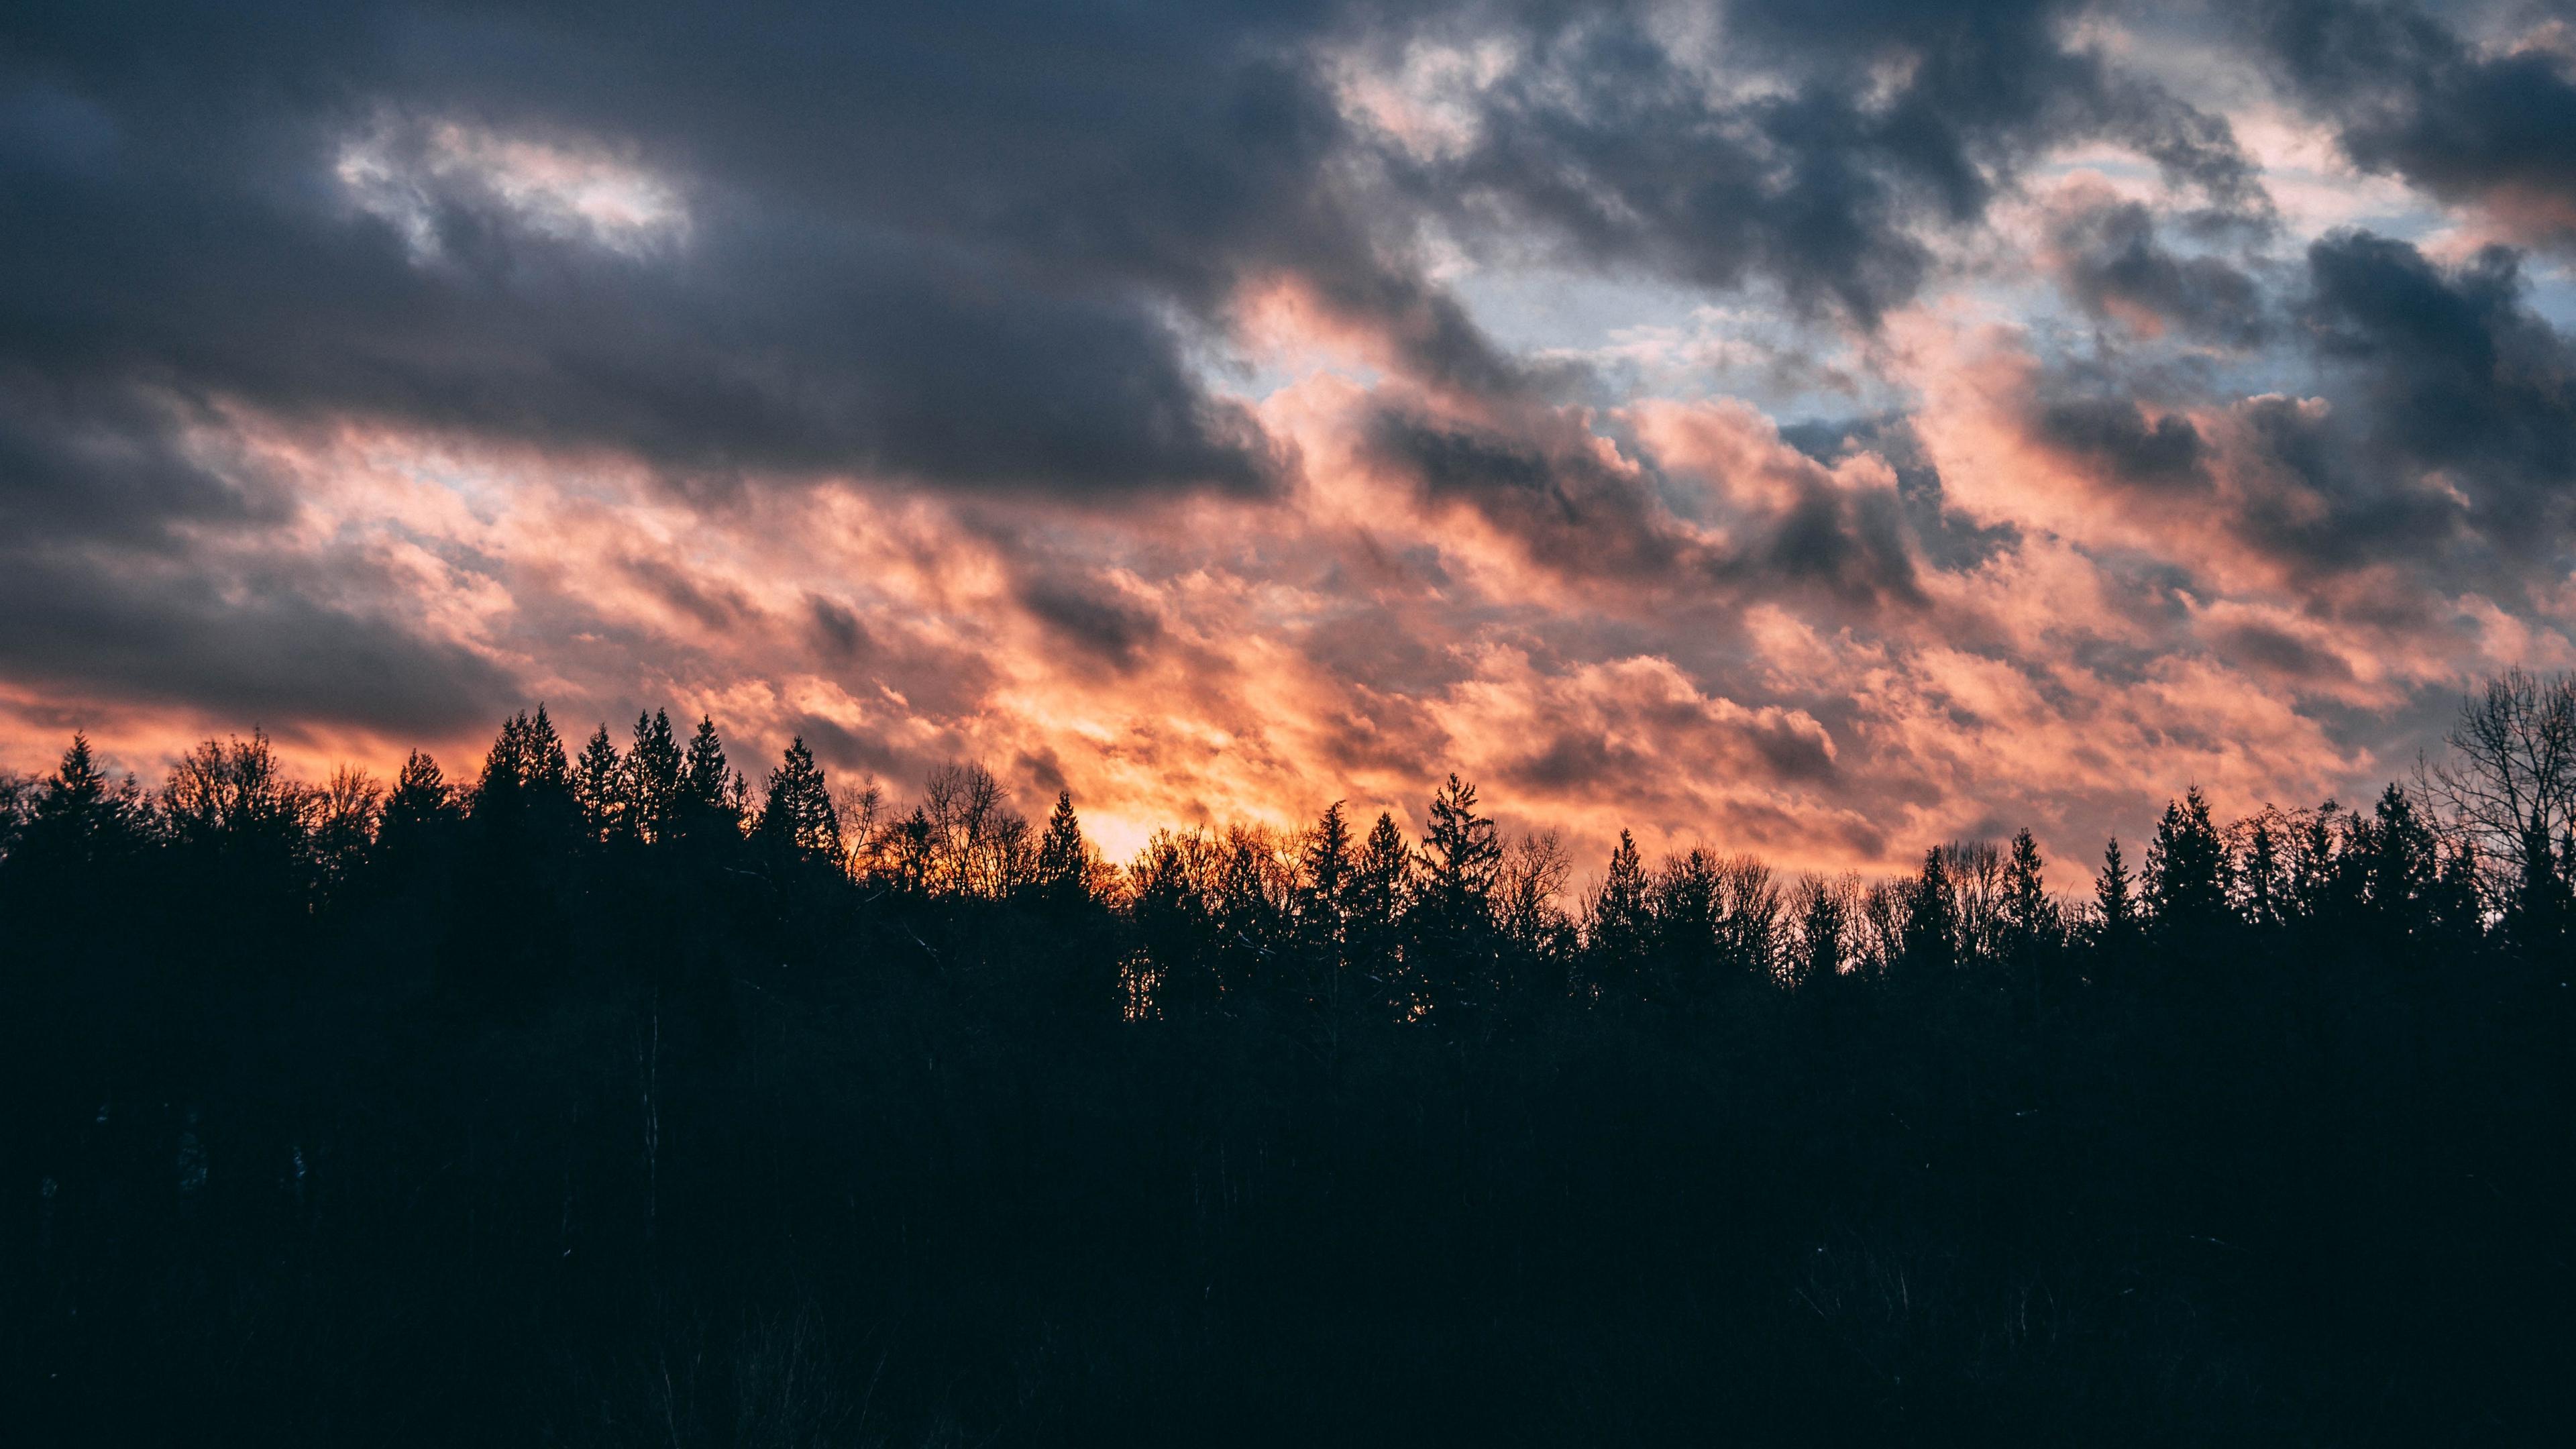 clouds trees sky sunset 4k 1540574904 - clouds, trees, sky, sunset 4k - Trees, Sky, Clouds